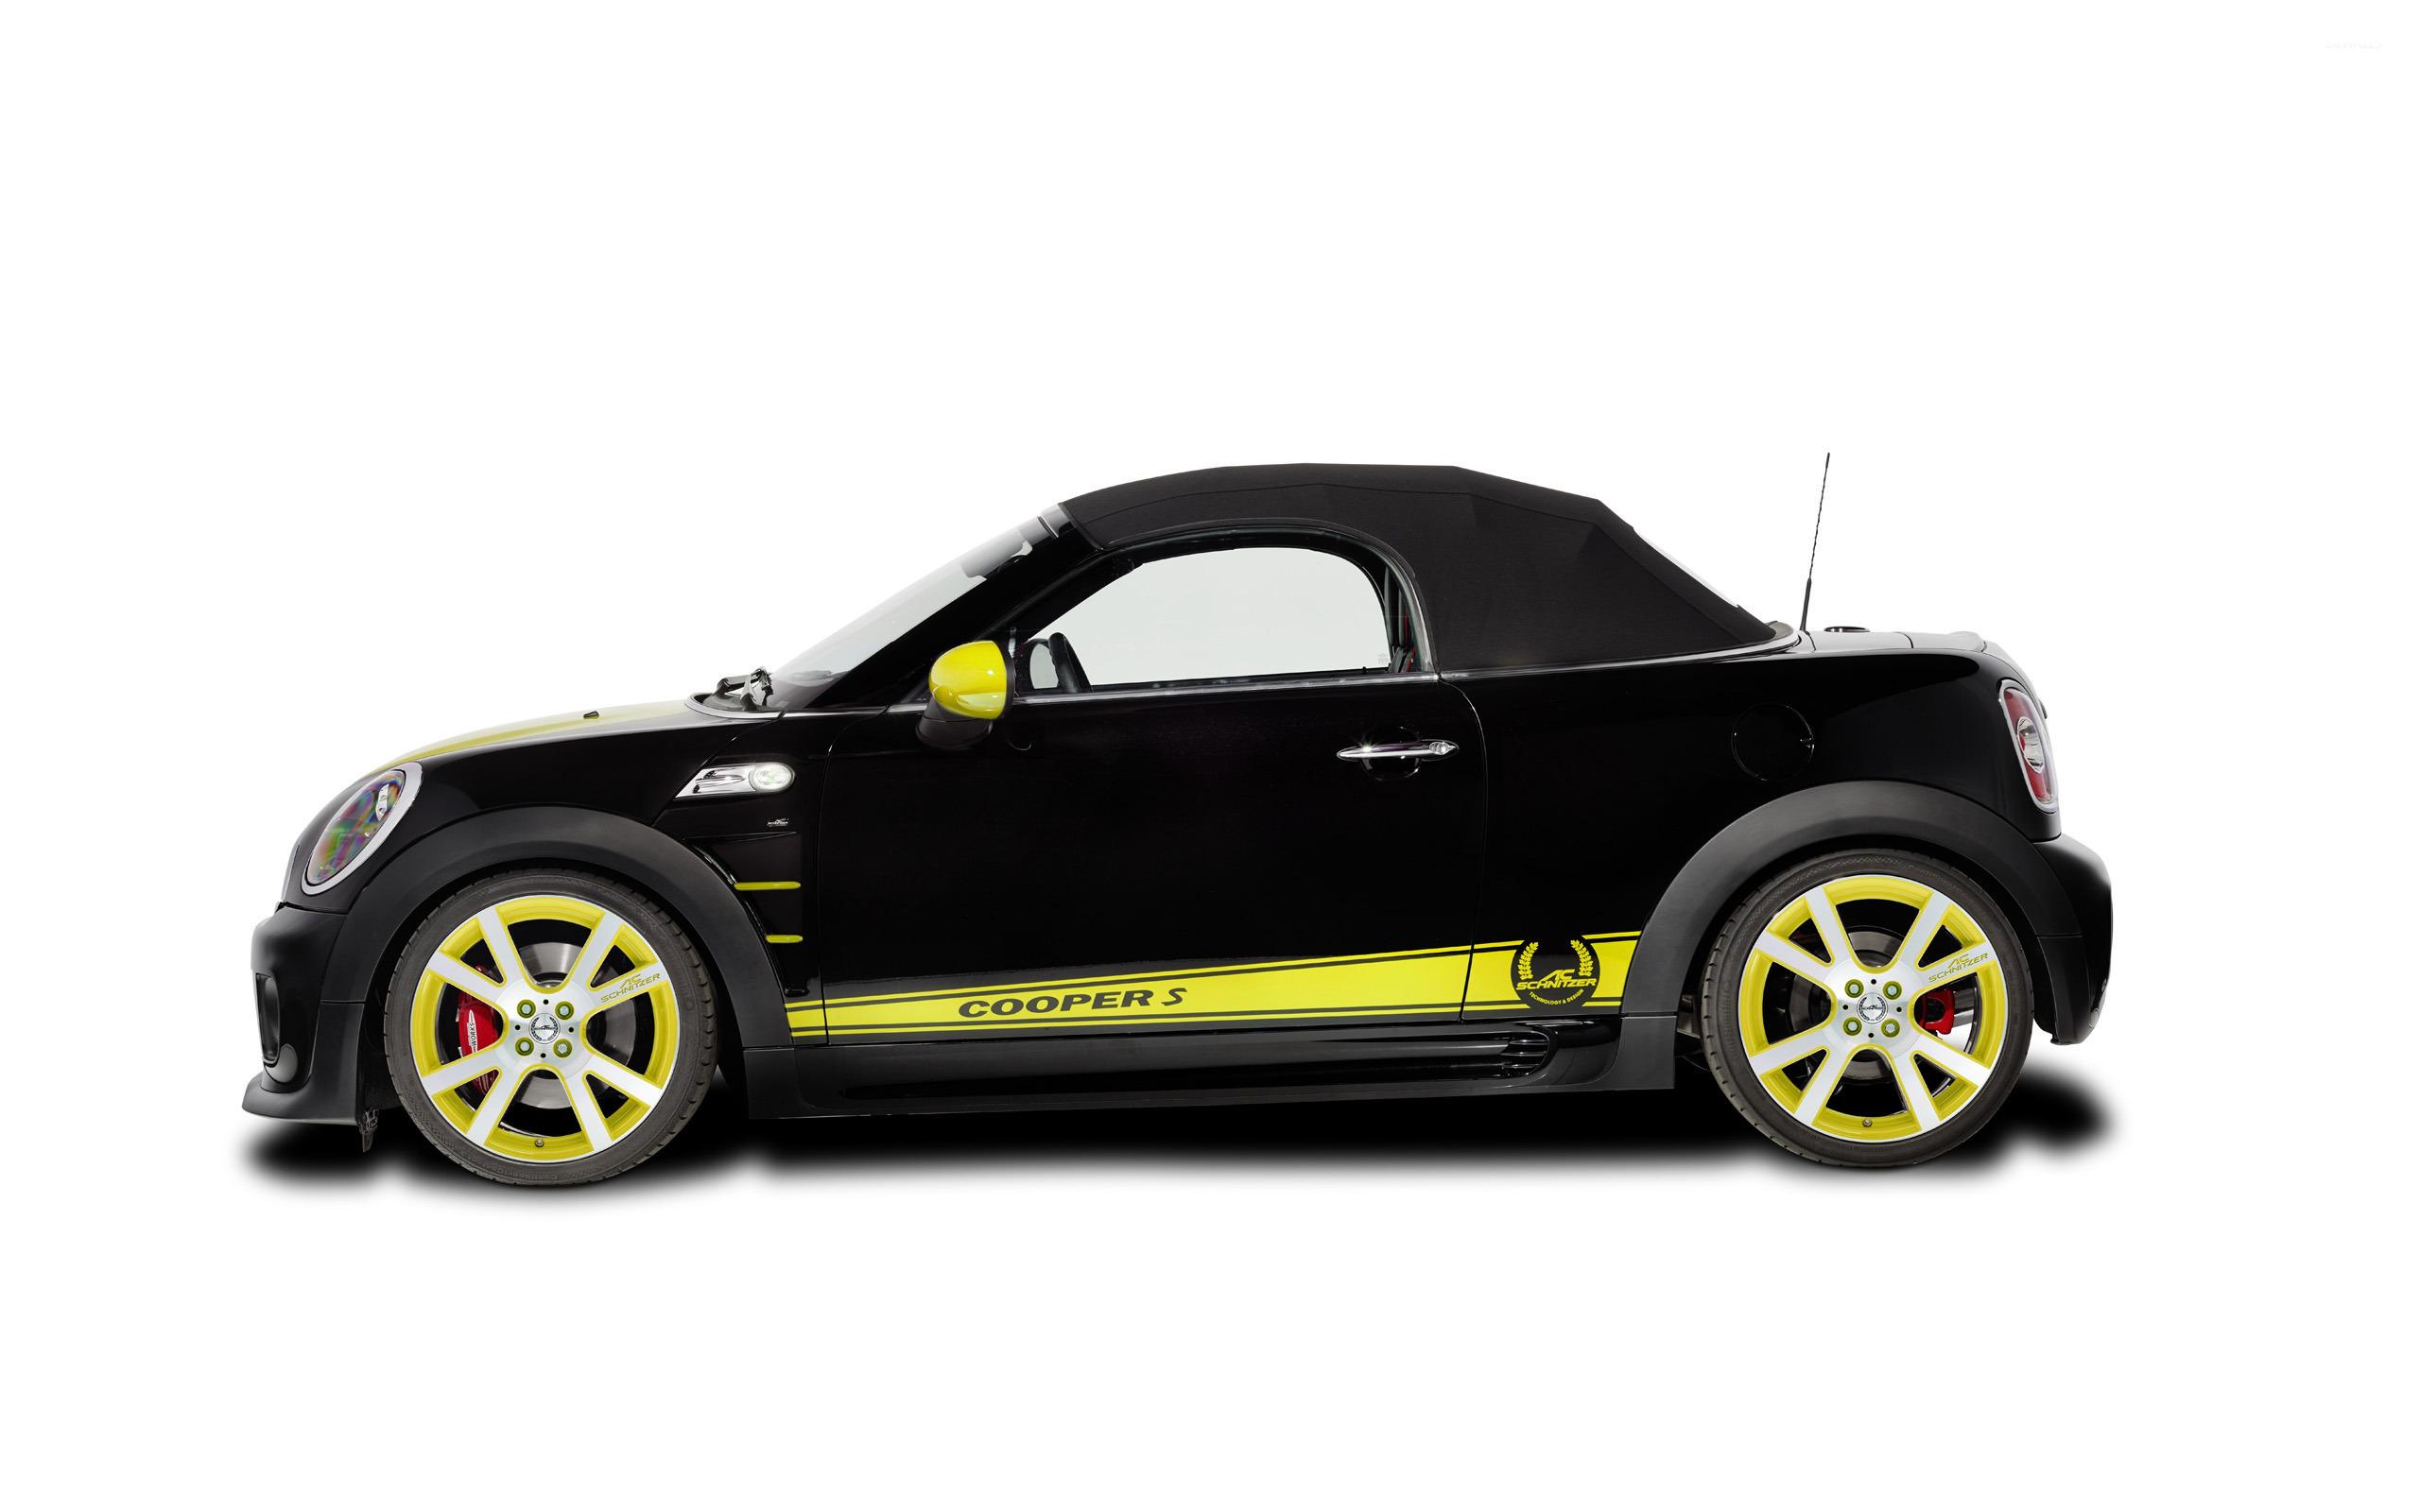 Mini Roadster Concept Wallpaper Mini Cars 97 Wallpapers